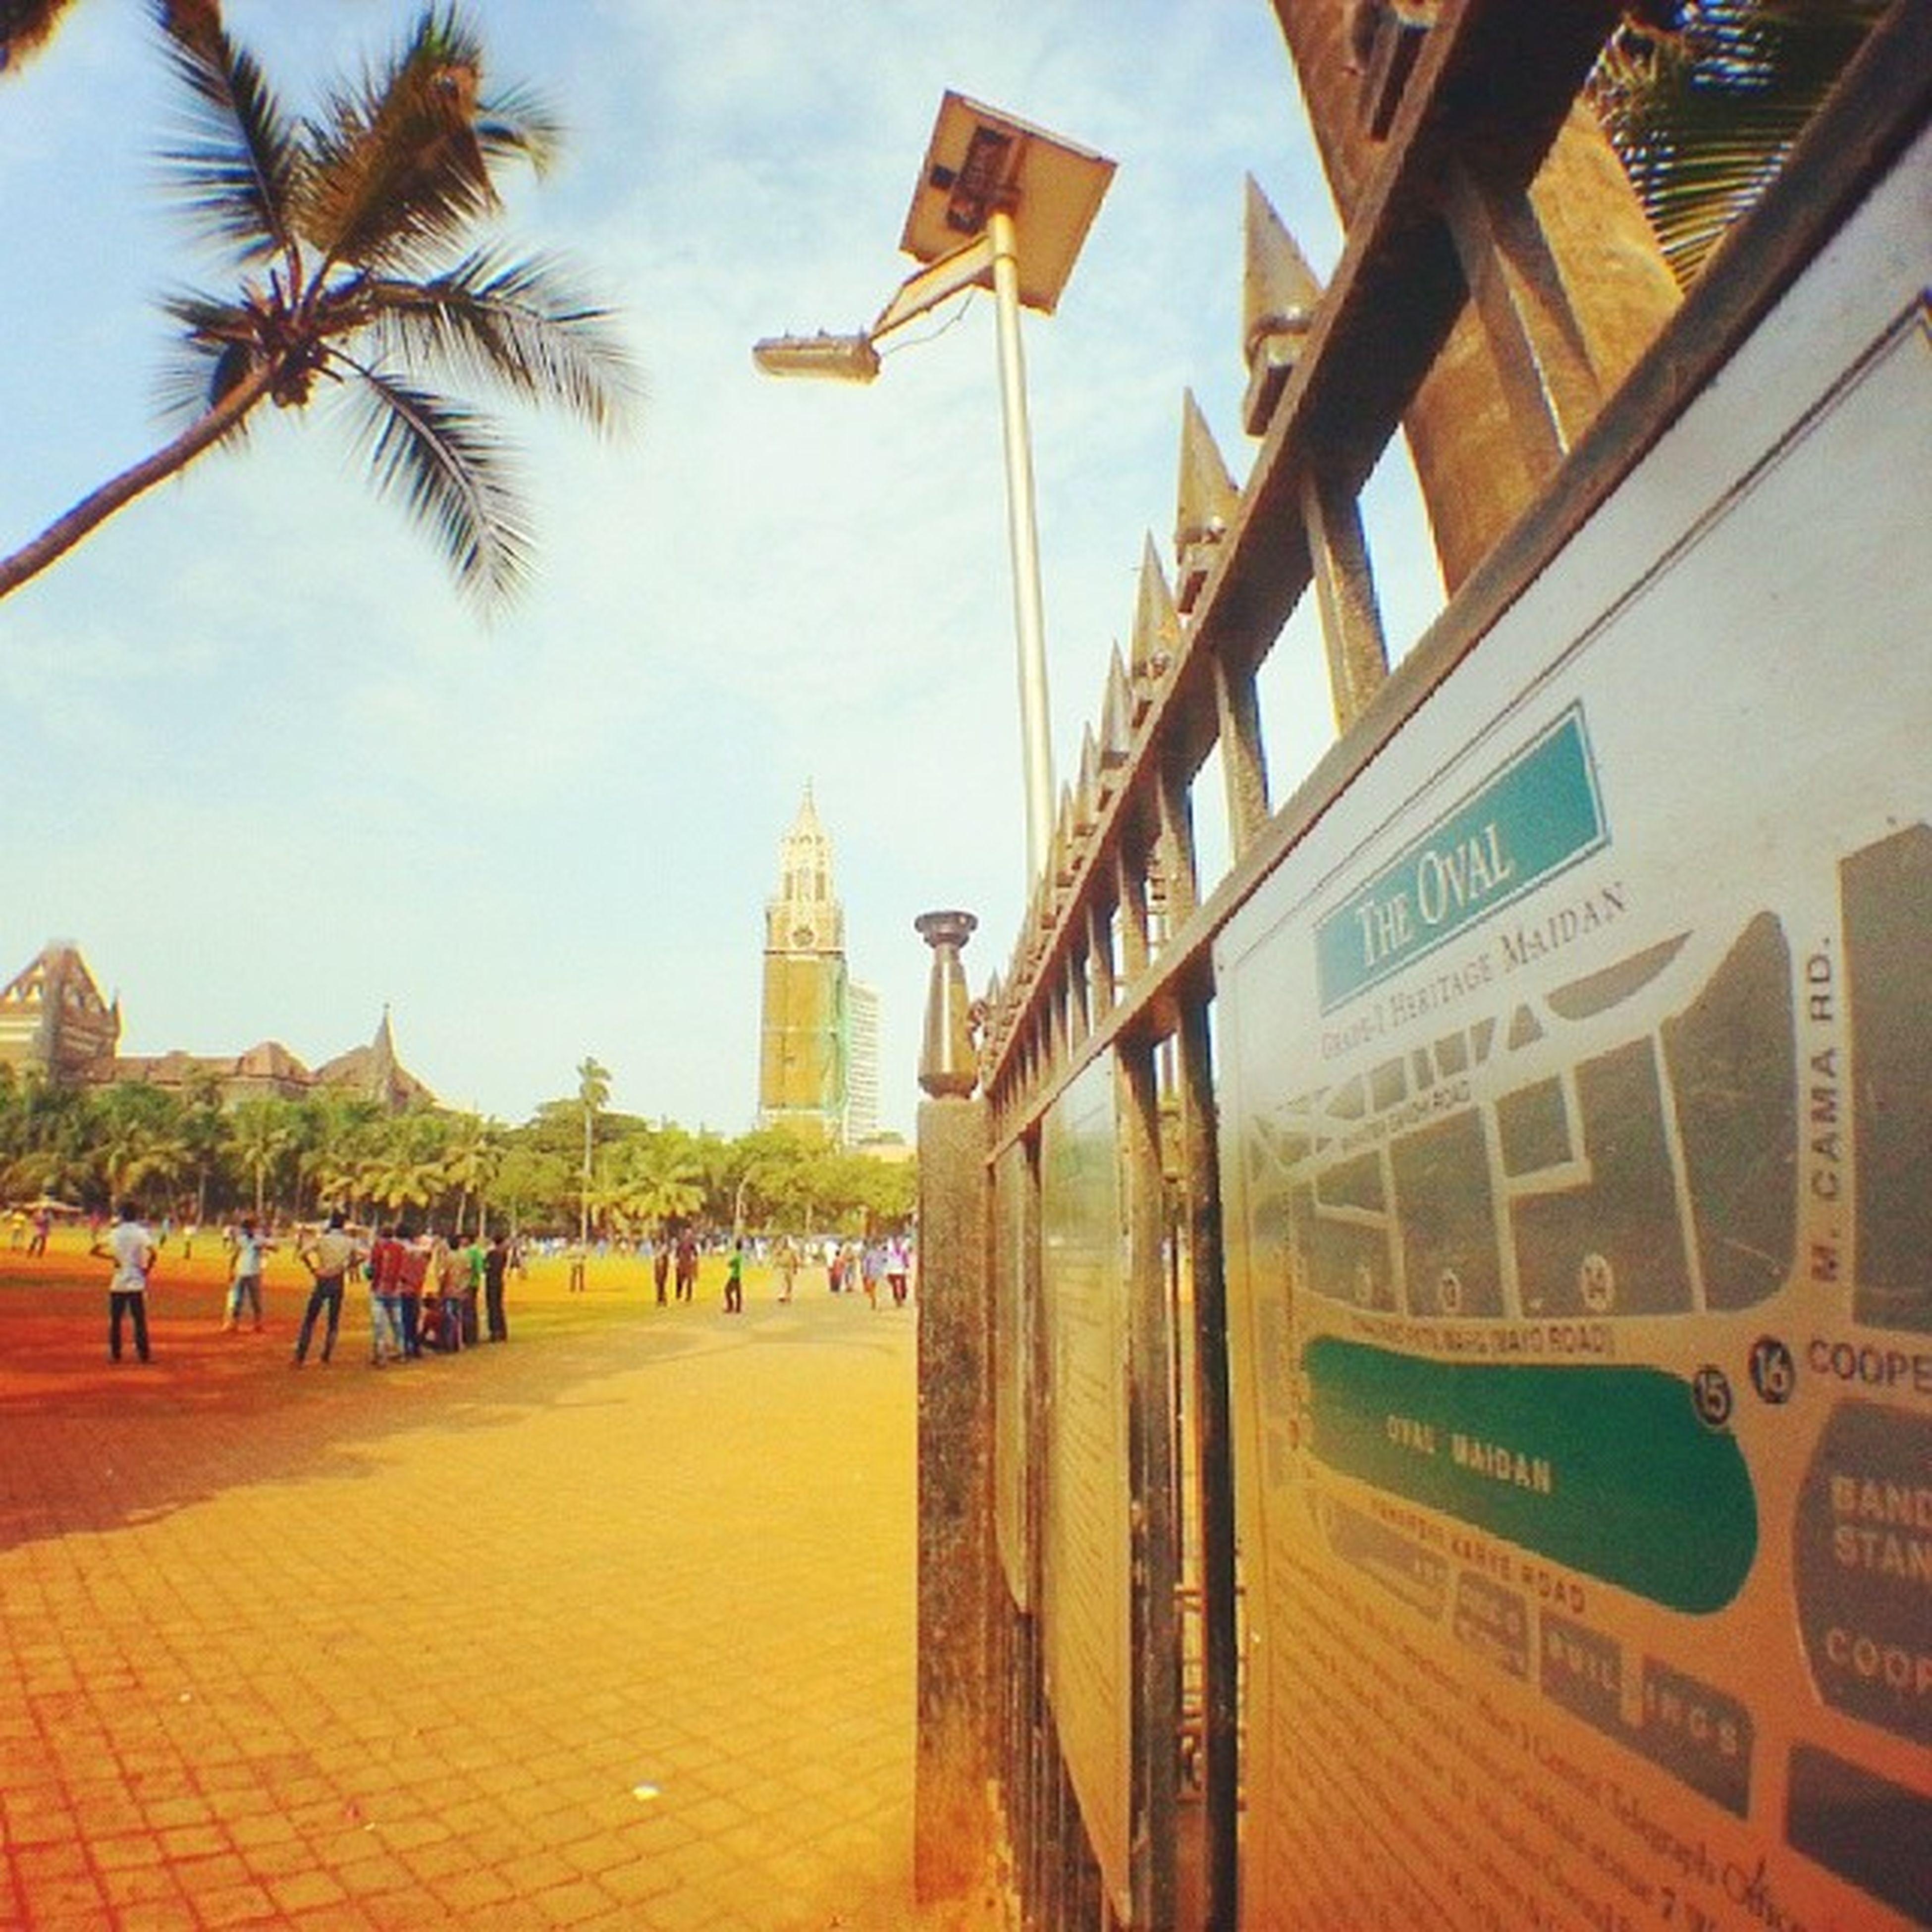 WWIM9mumbai Wwim9 @mumbai_igers @coxandkingsin Grabyourdreams Mumbaimasala coloursofmumbai